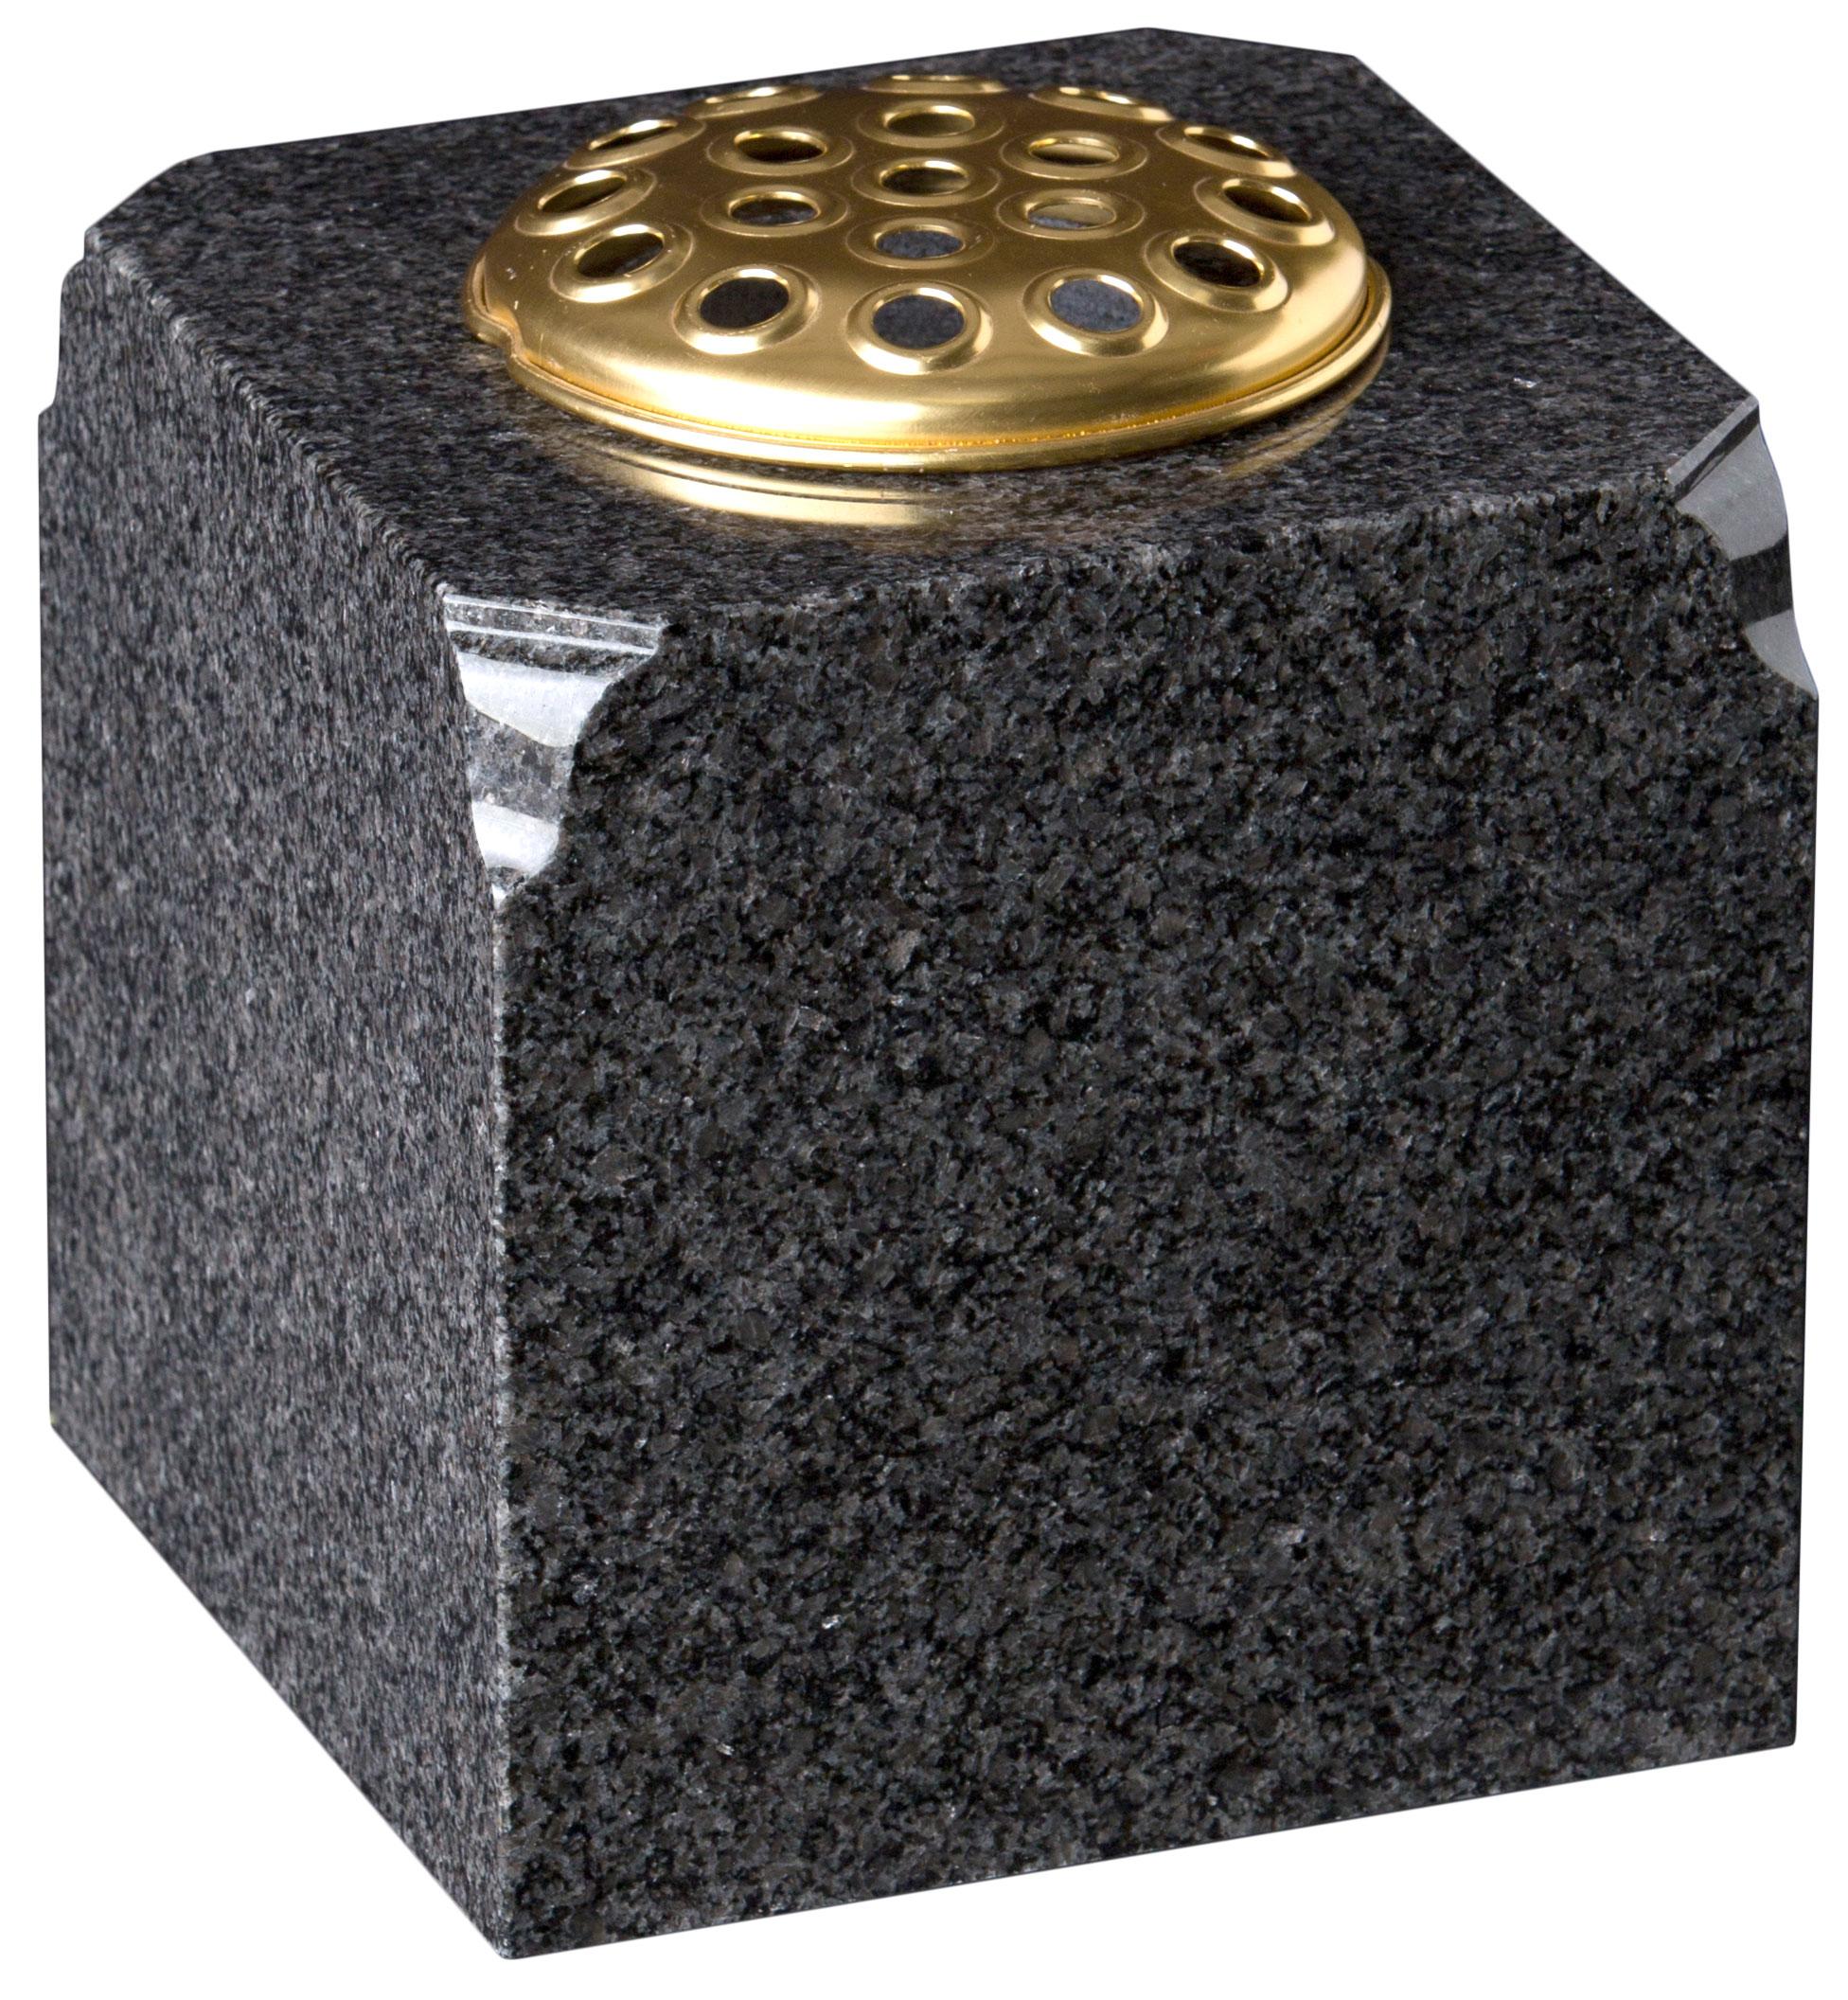 16202 Square vase